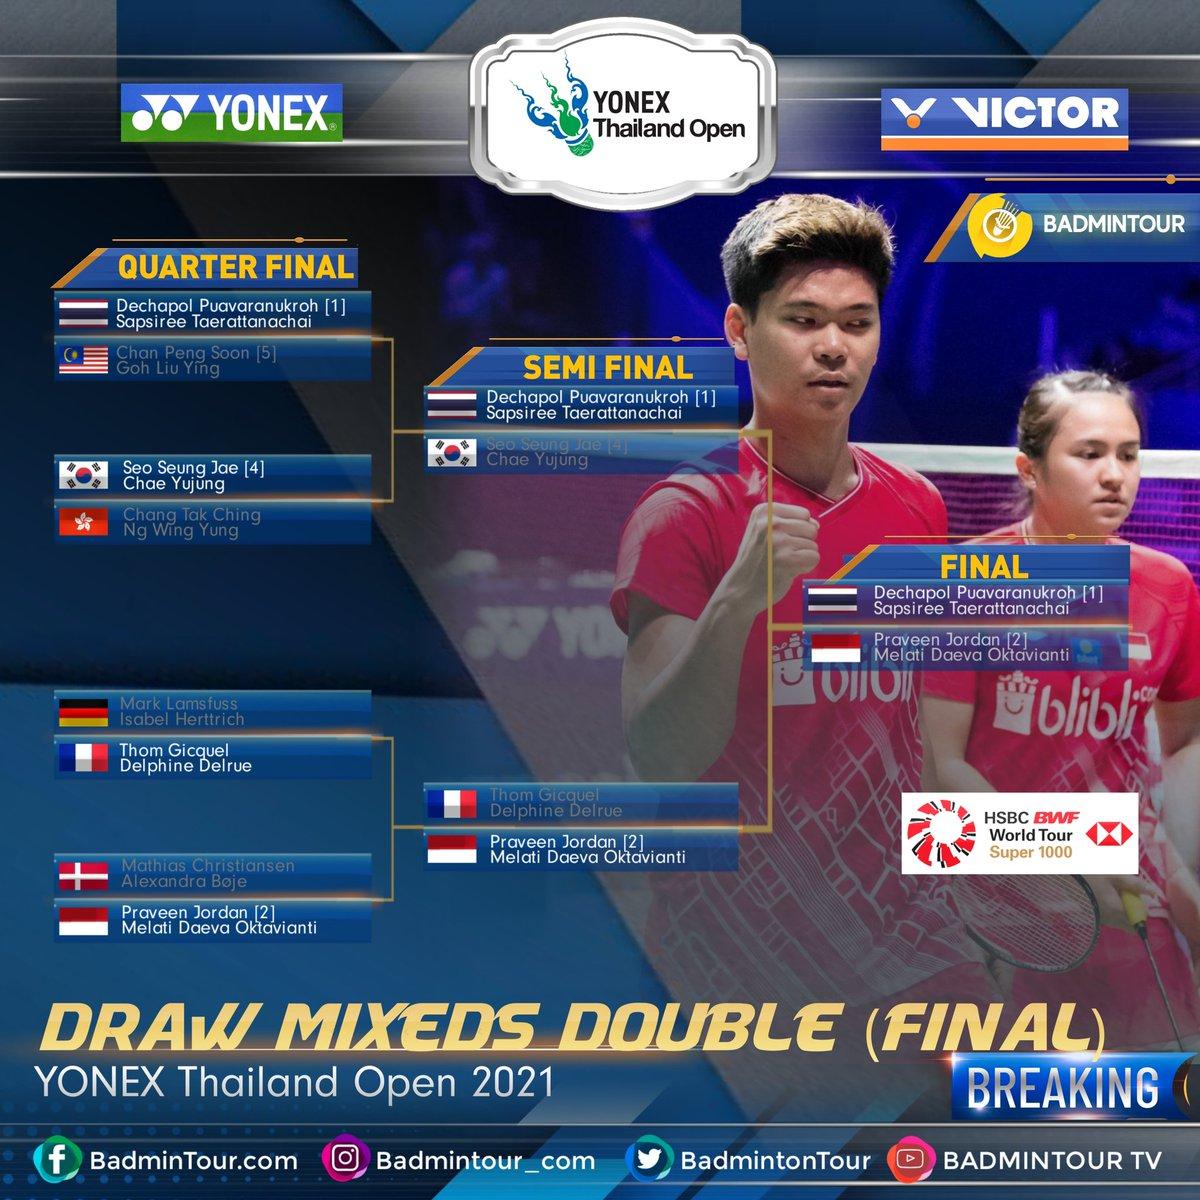 BREAKINGGGG😍😍😍 #YonexThailandOpen  Here Are LIST DRAWING ( FINAL) (Mixed Double) YONEX Thailand Open 2021 (HSBC BWF World Tour Super 1000) https://t.co/RCFrMNuEVf